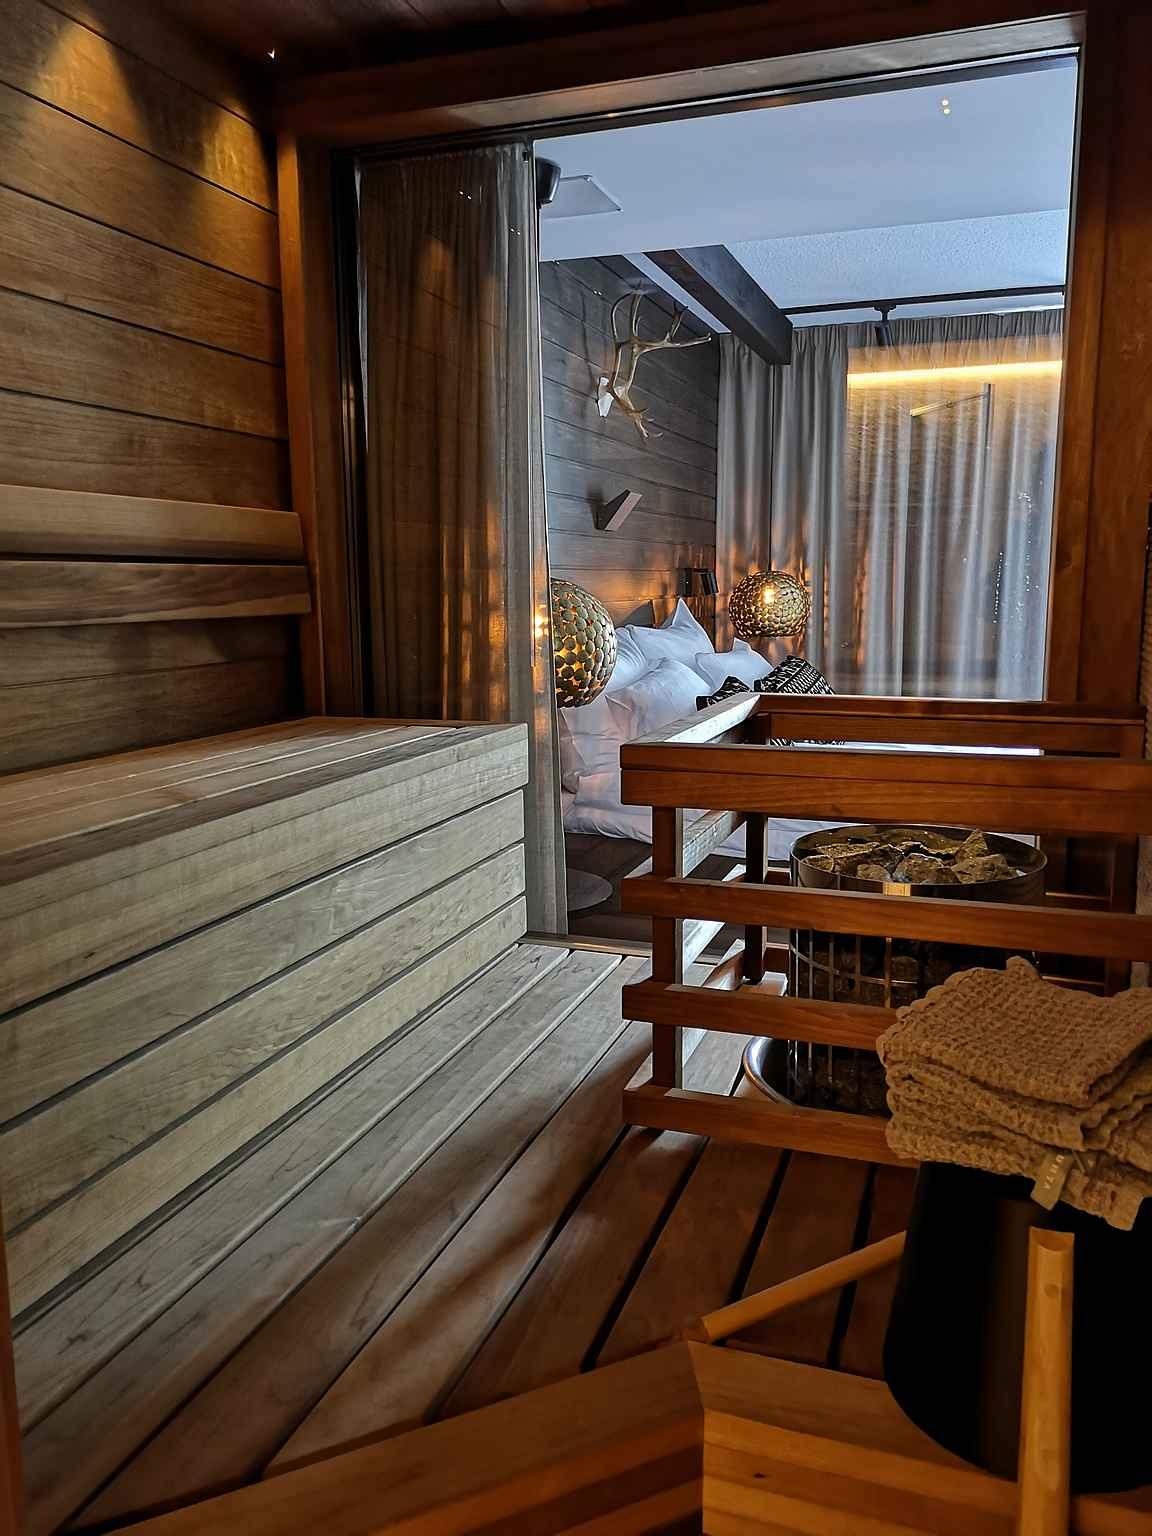 ... ja sauna tosi upea!